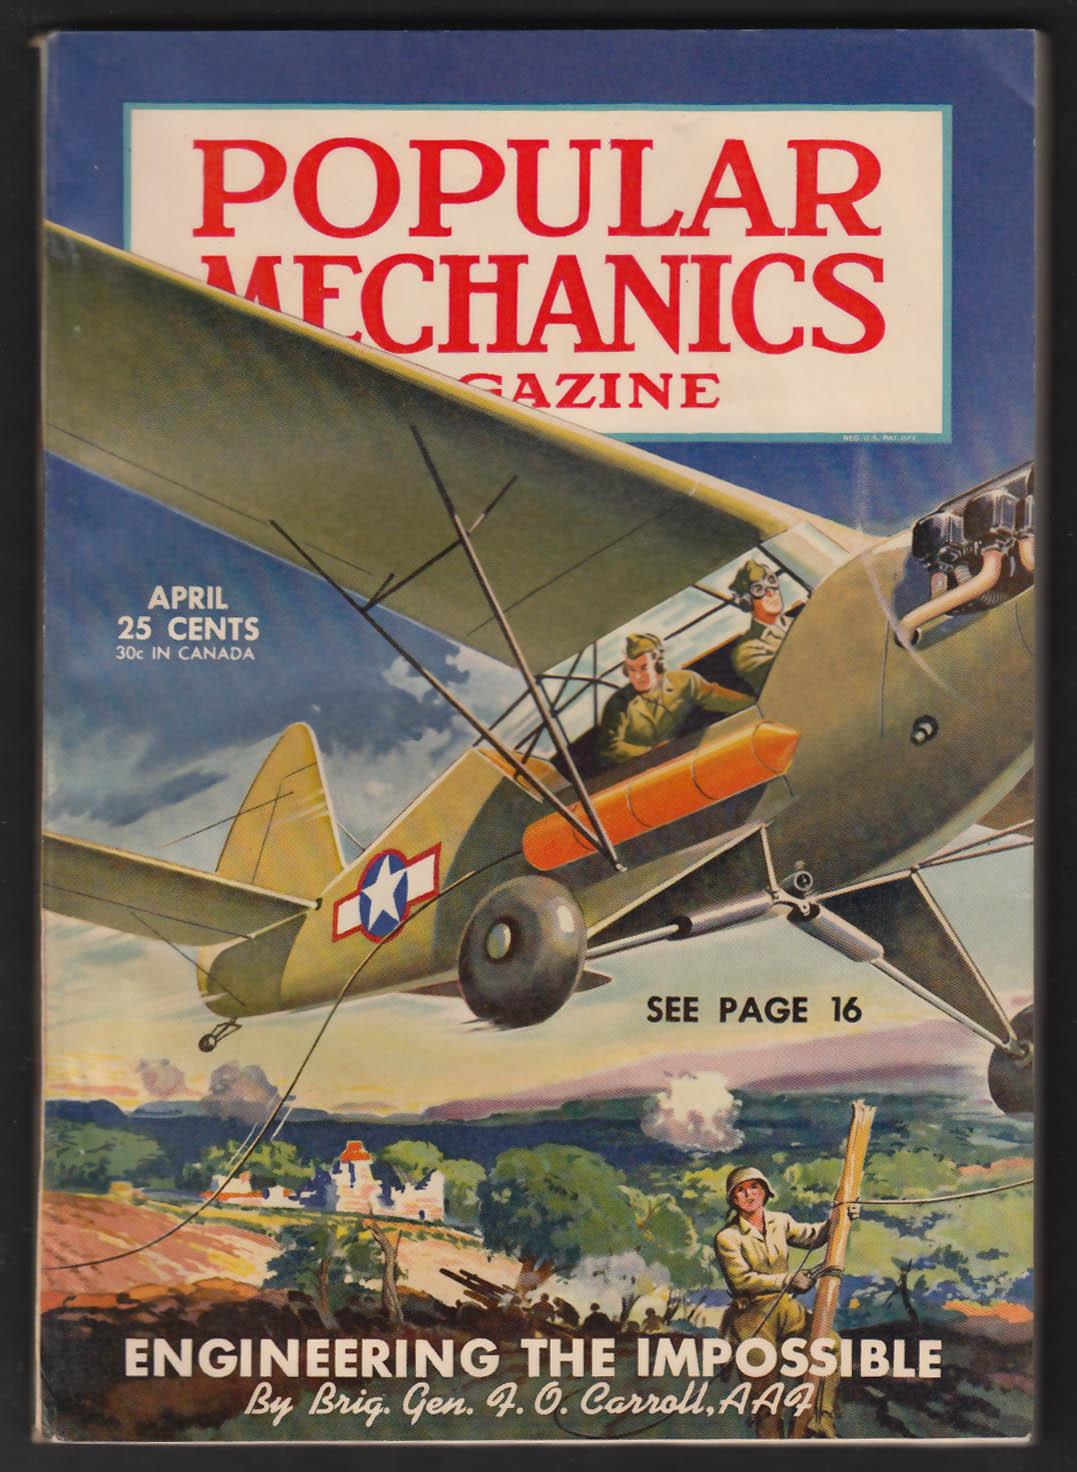 POPULAR MECHANICS US Army Aviation; Rebuilding Europe + 4 1945